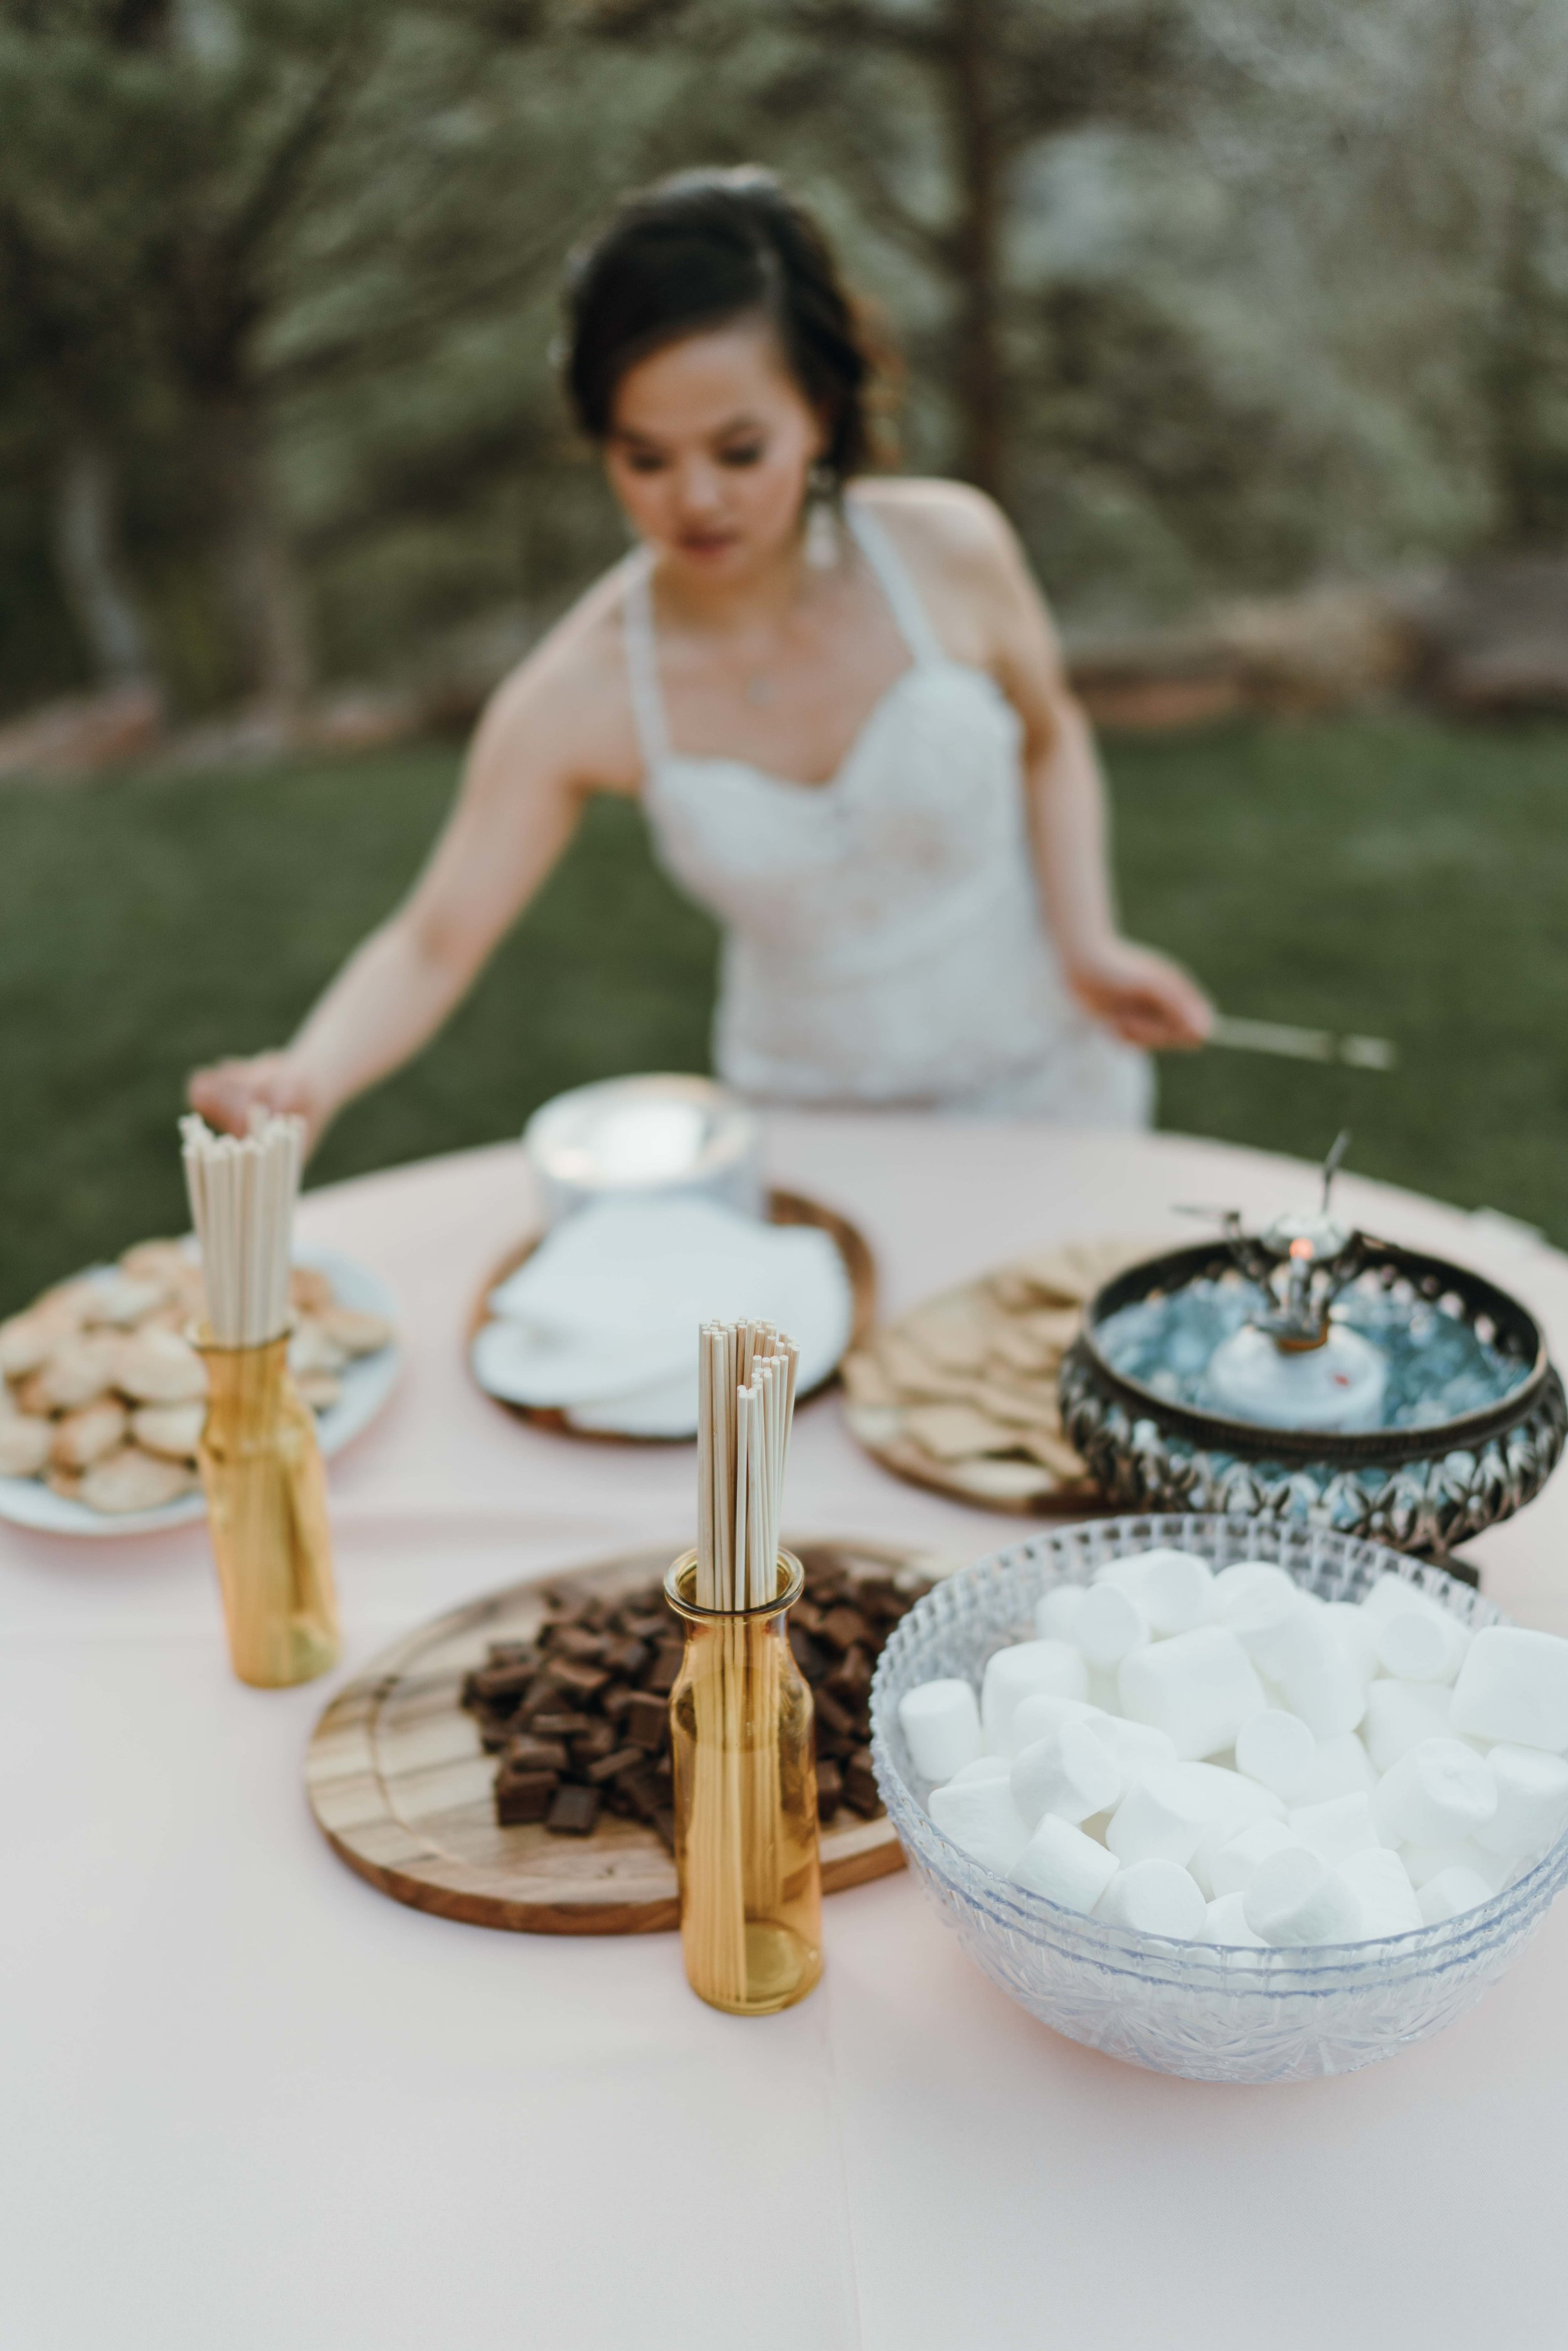 denver wedding photographer lioncrest manor in lyons ben and mali -DSC06819.jpg